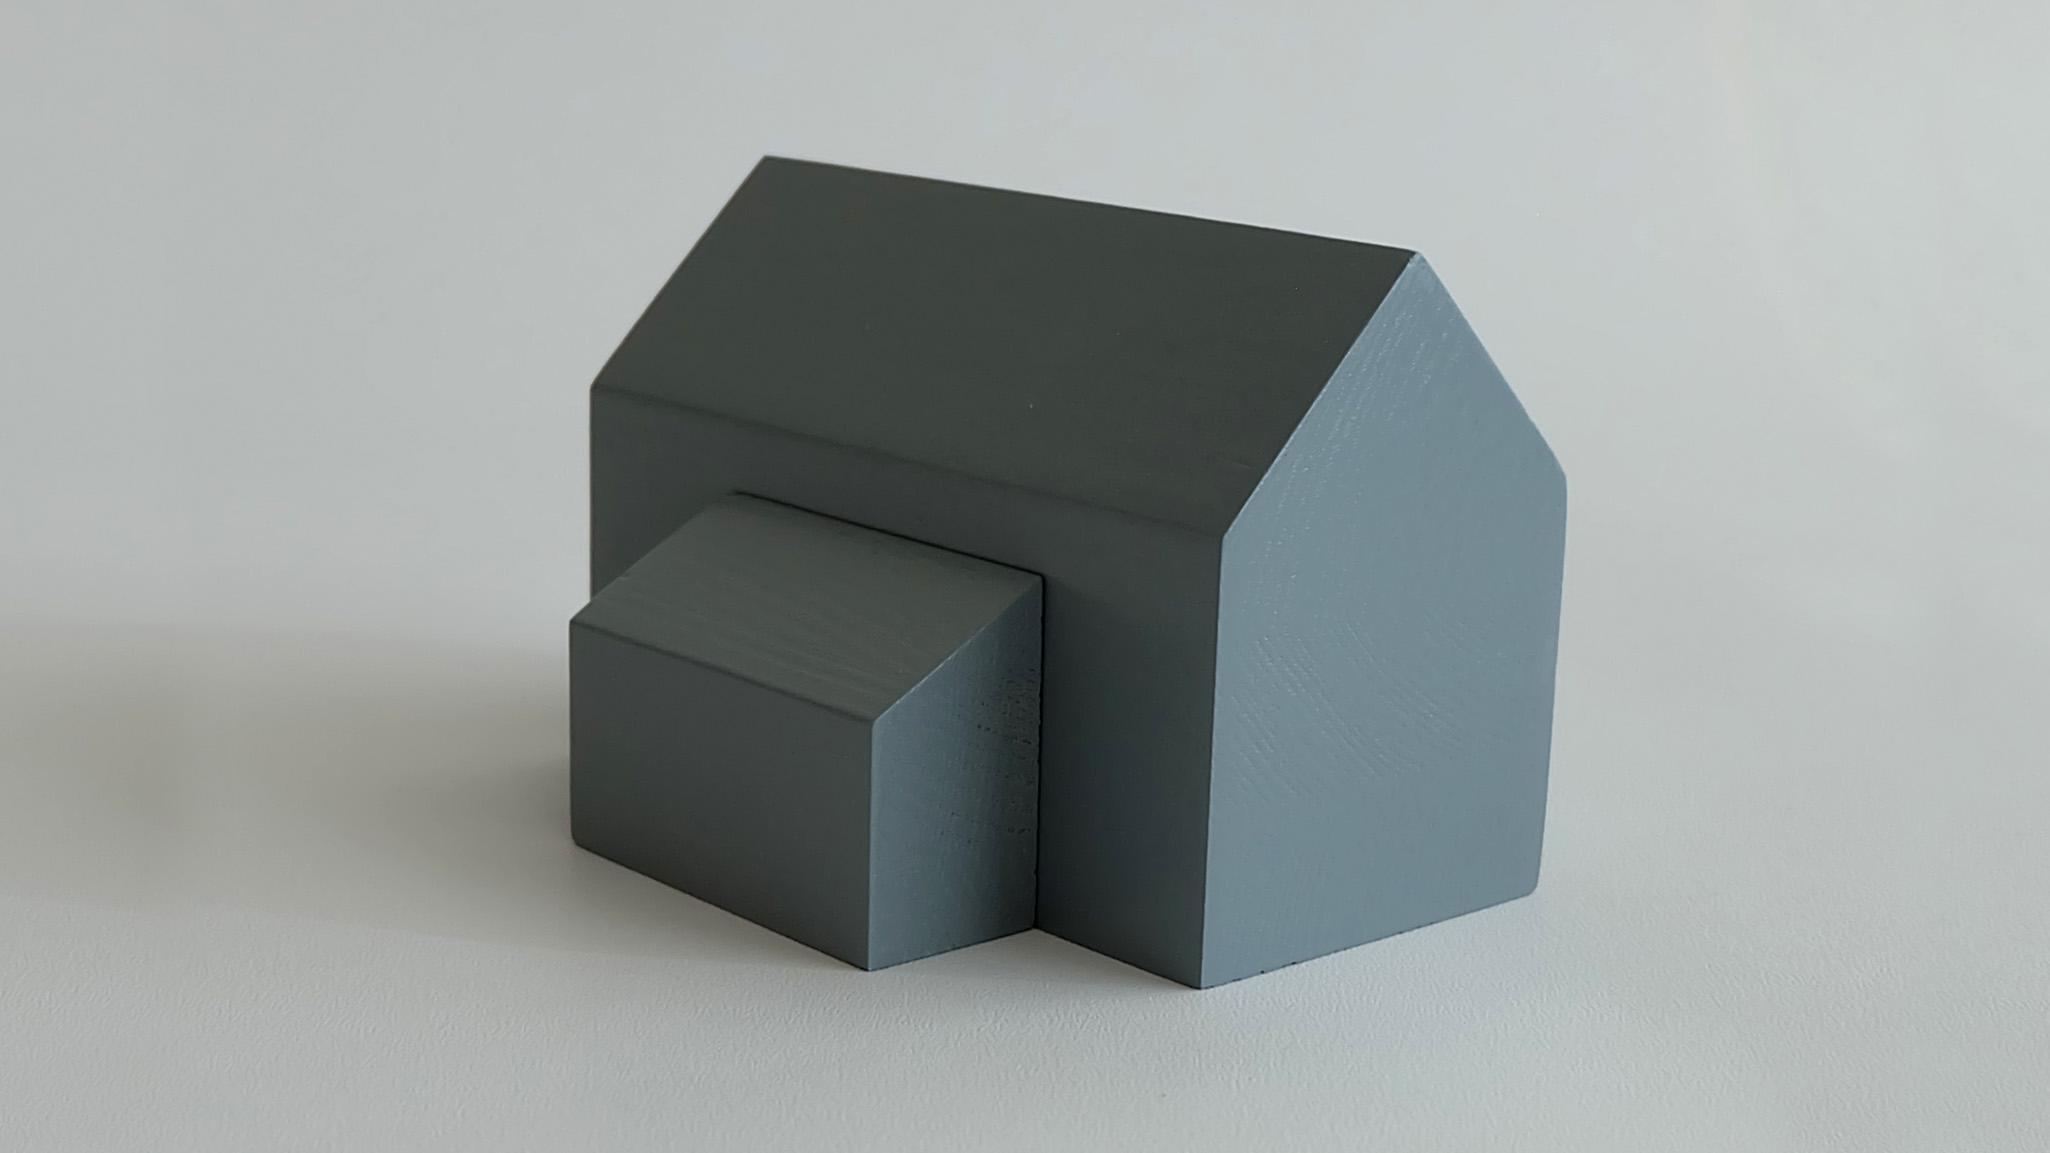 L15:  L13 + mono-pitch roof porch